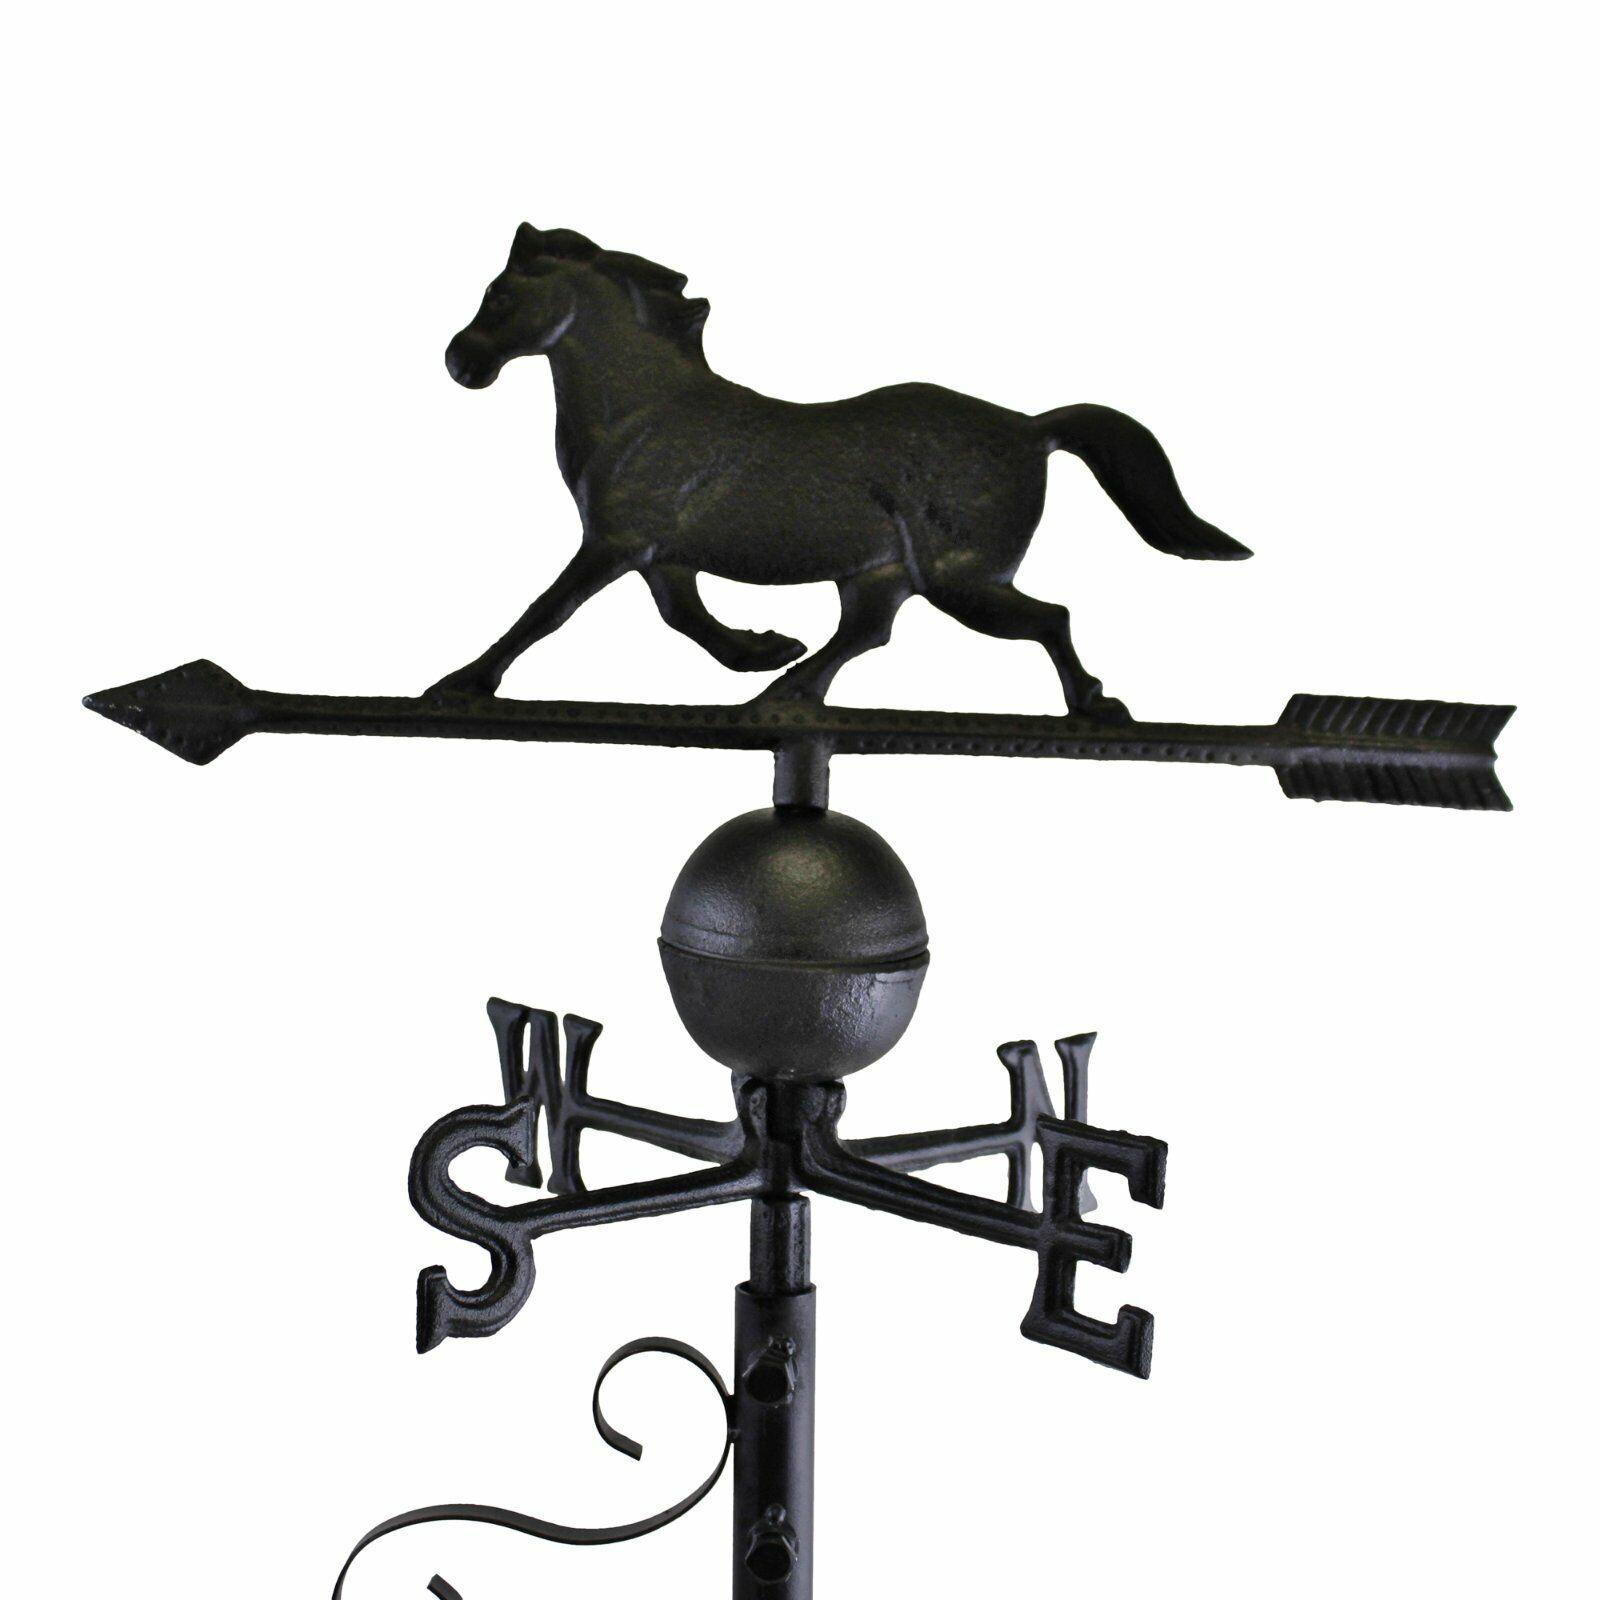 Horse Design Cast Iron Large Black Mountable Weathervane - Equestrian